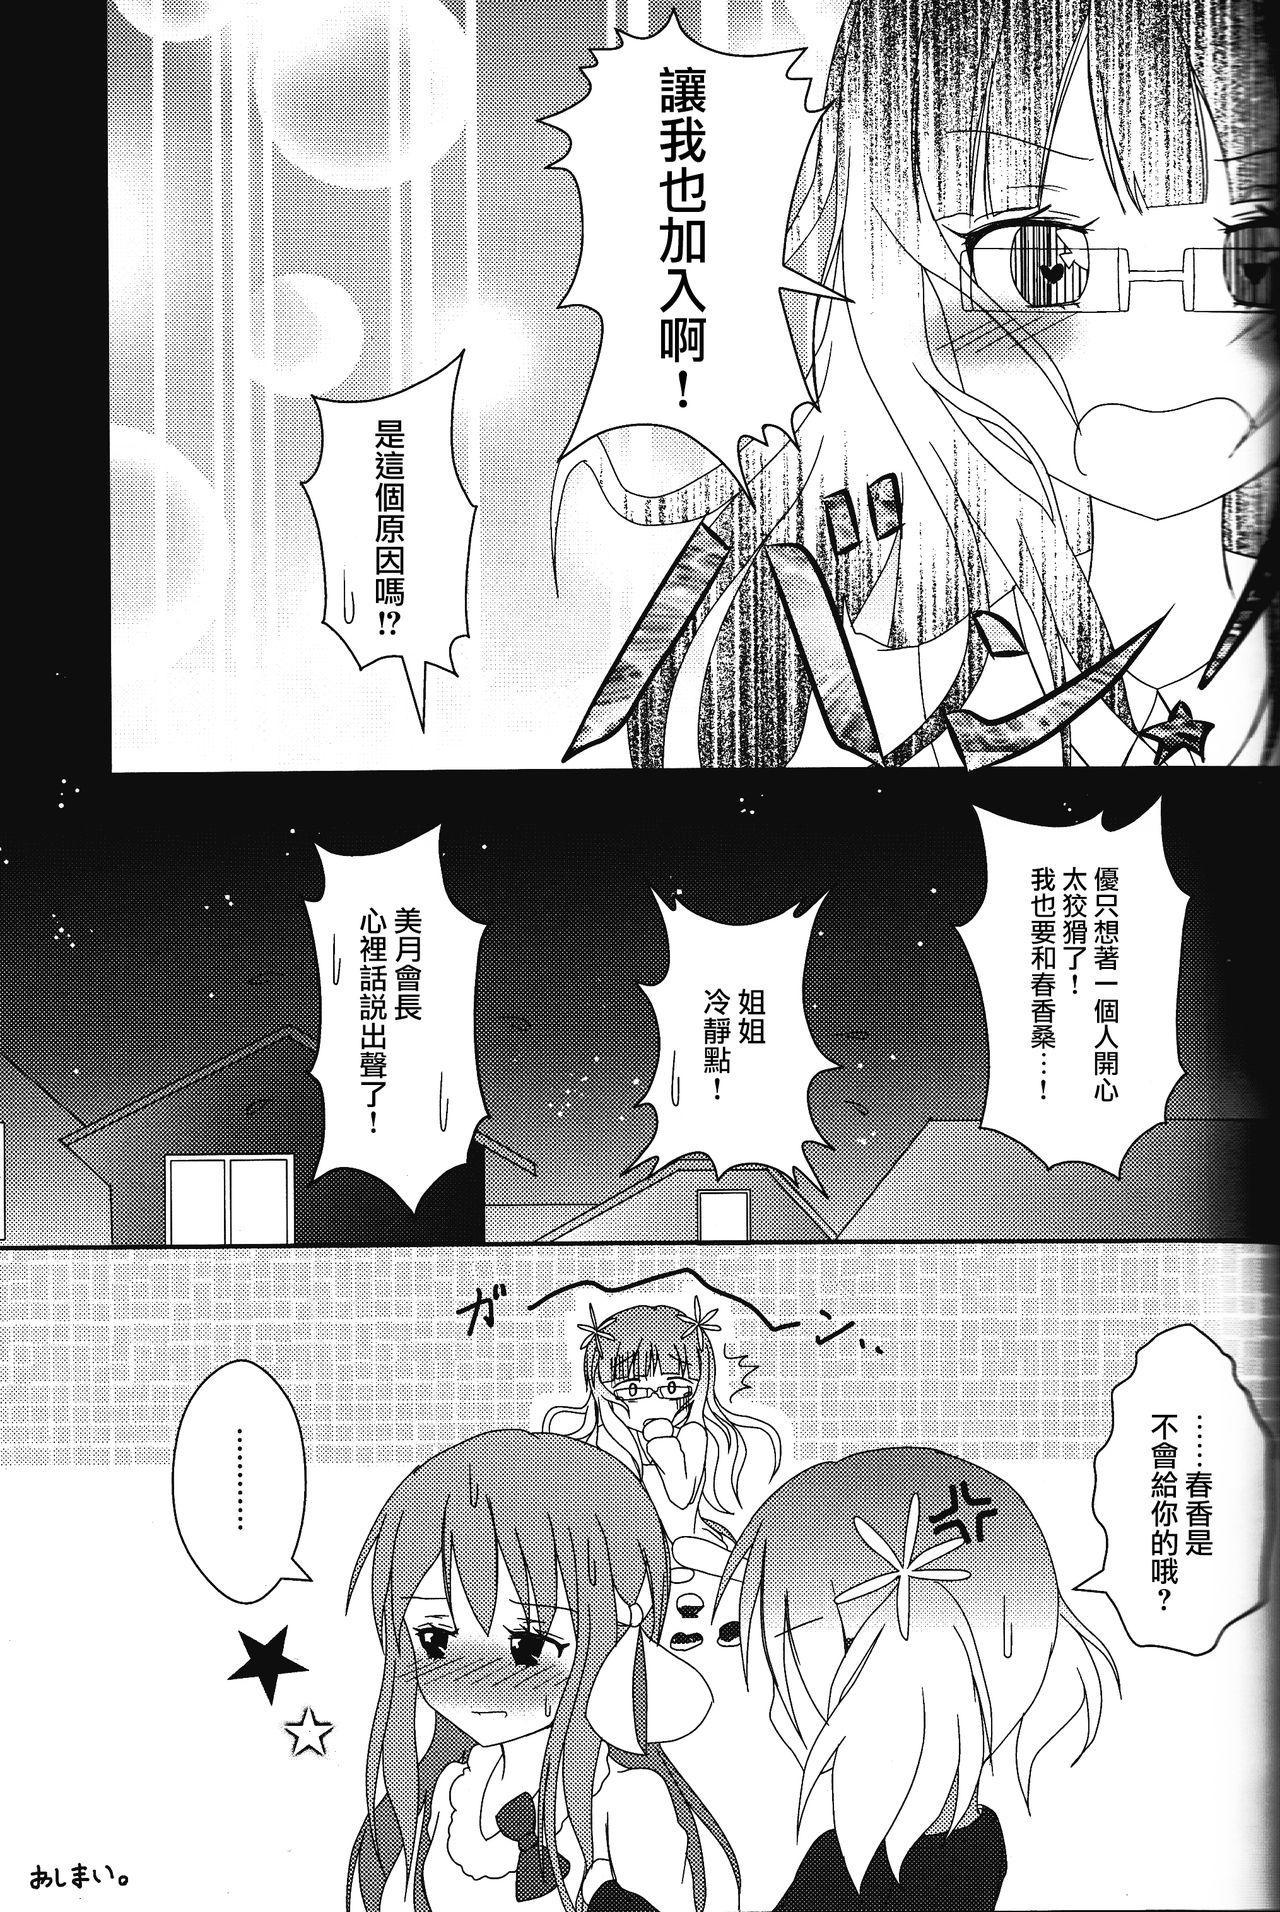 Yozakura Trick 9